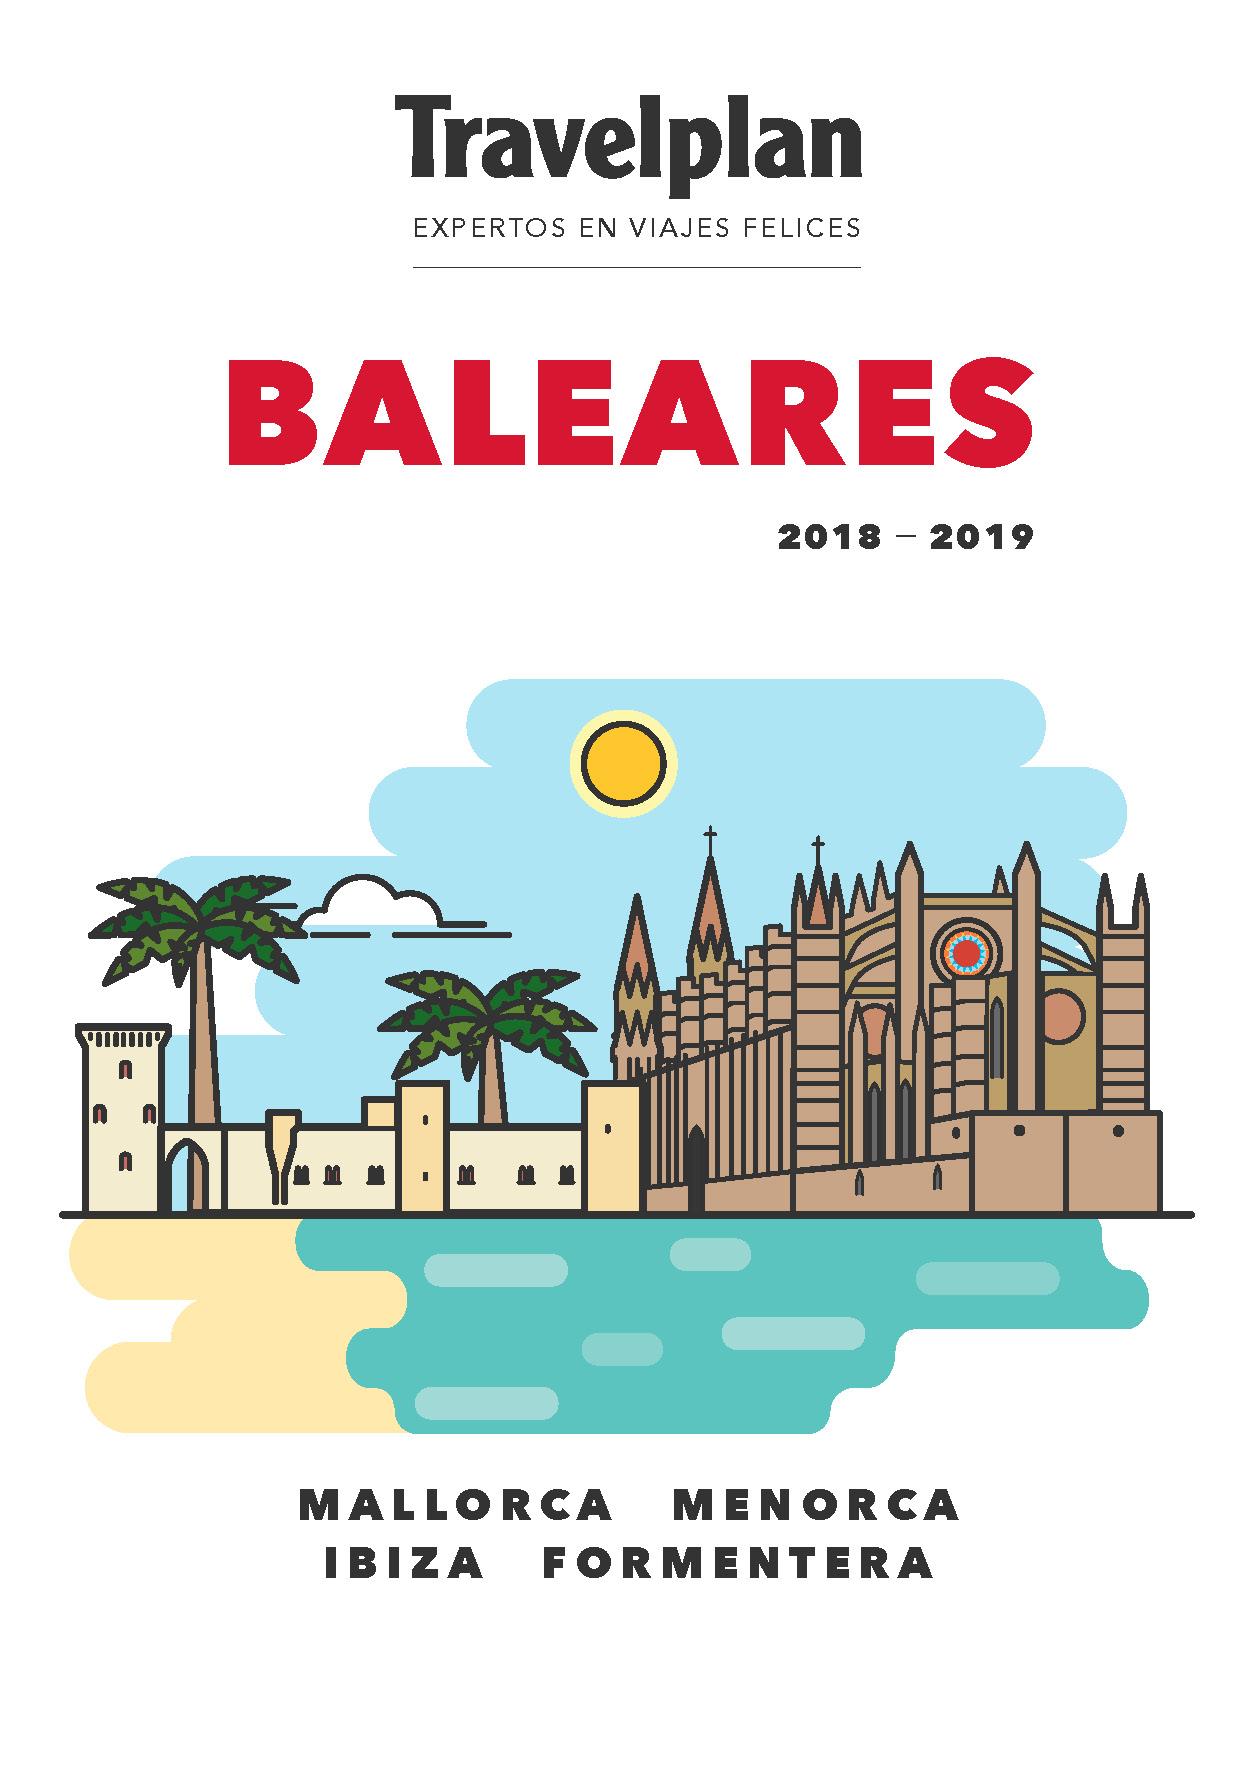 Catalogo Travelplan Baleares 2018-2019